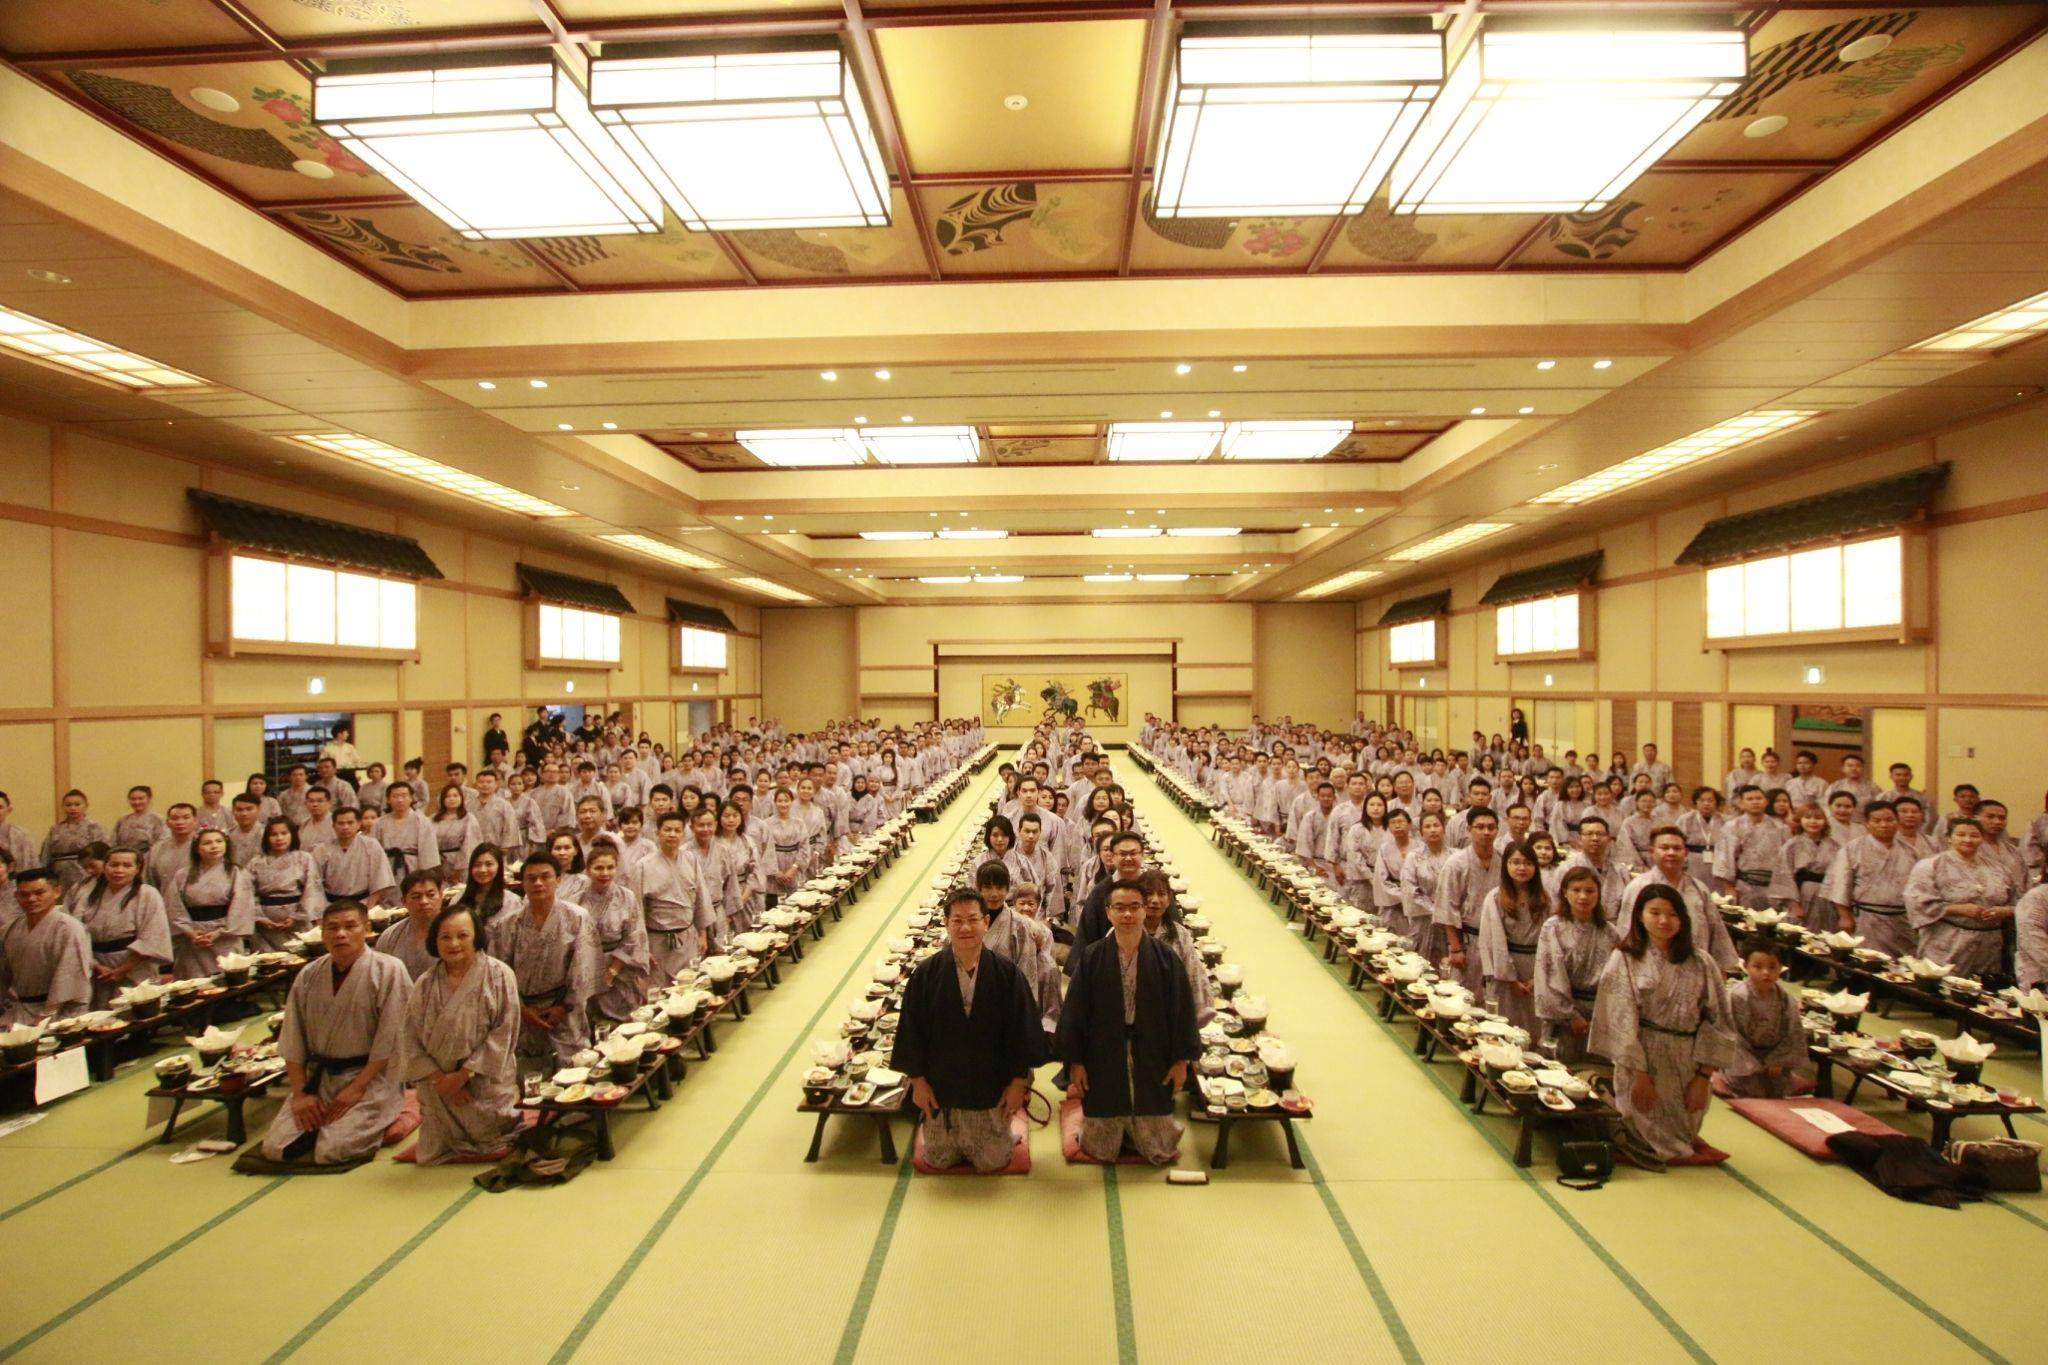 SUCCESSMORE พานักธุรกิจกว่า 422 ท่าน บินลัดฟ้าสู่ ซัปโปโร ฮอกไกโด ประเทศญี่ปุ่น (8)